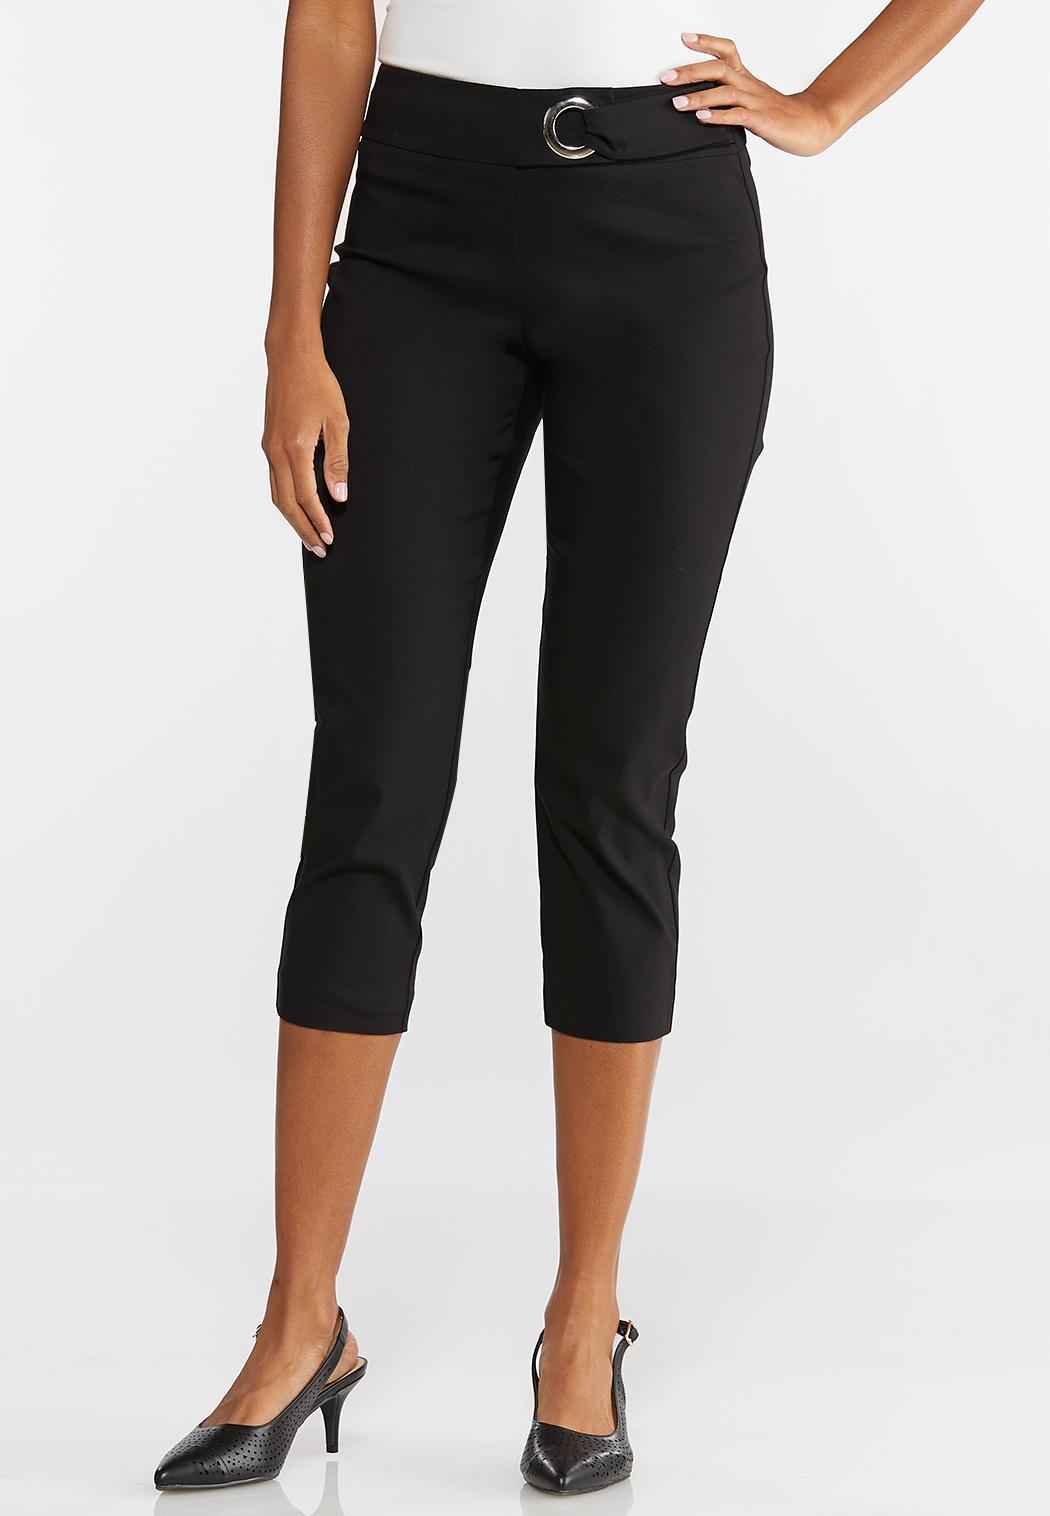 Hardware Cropped Pants